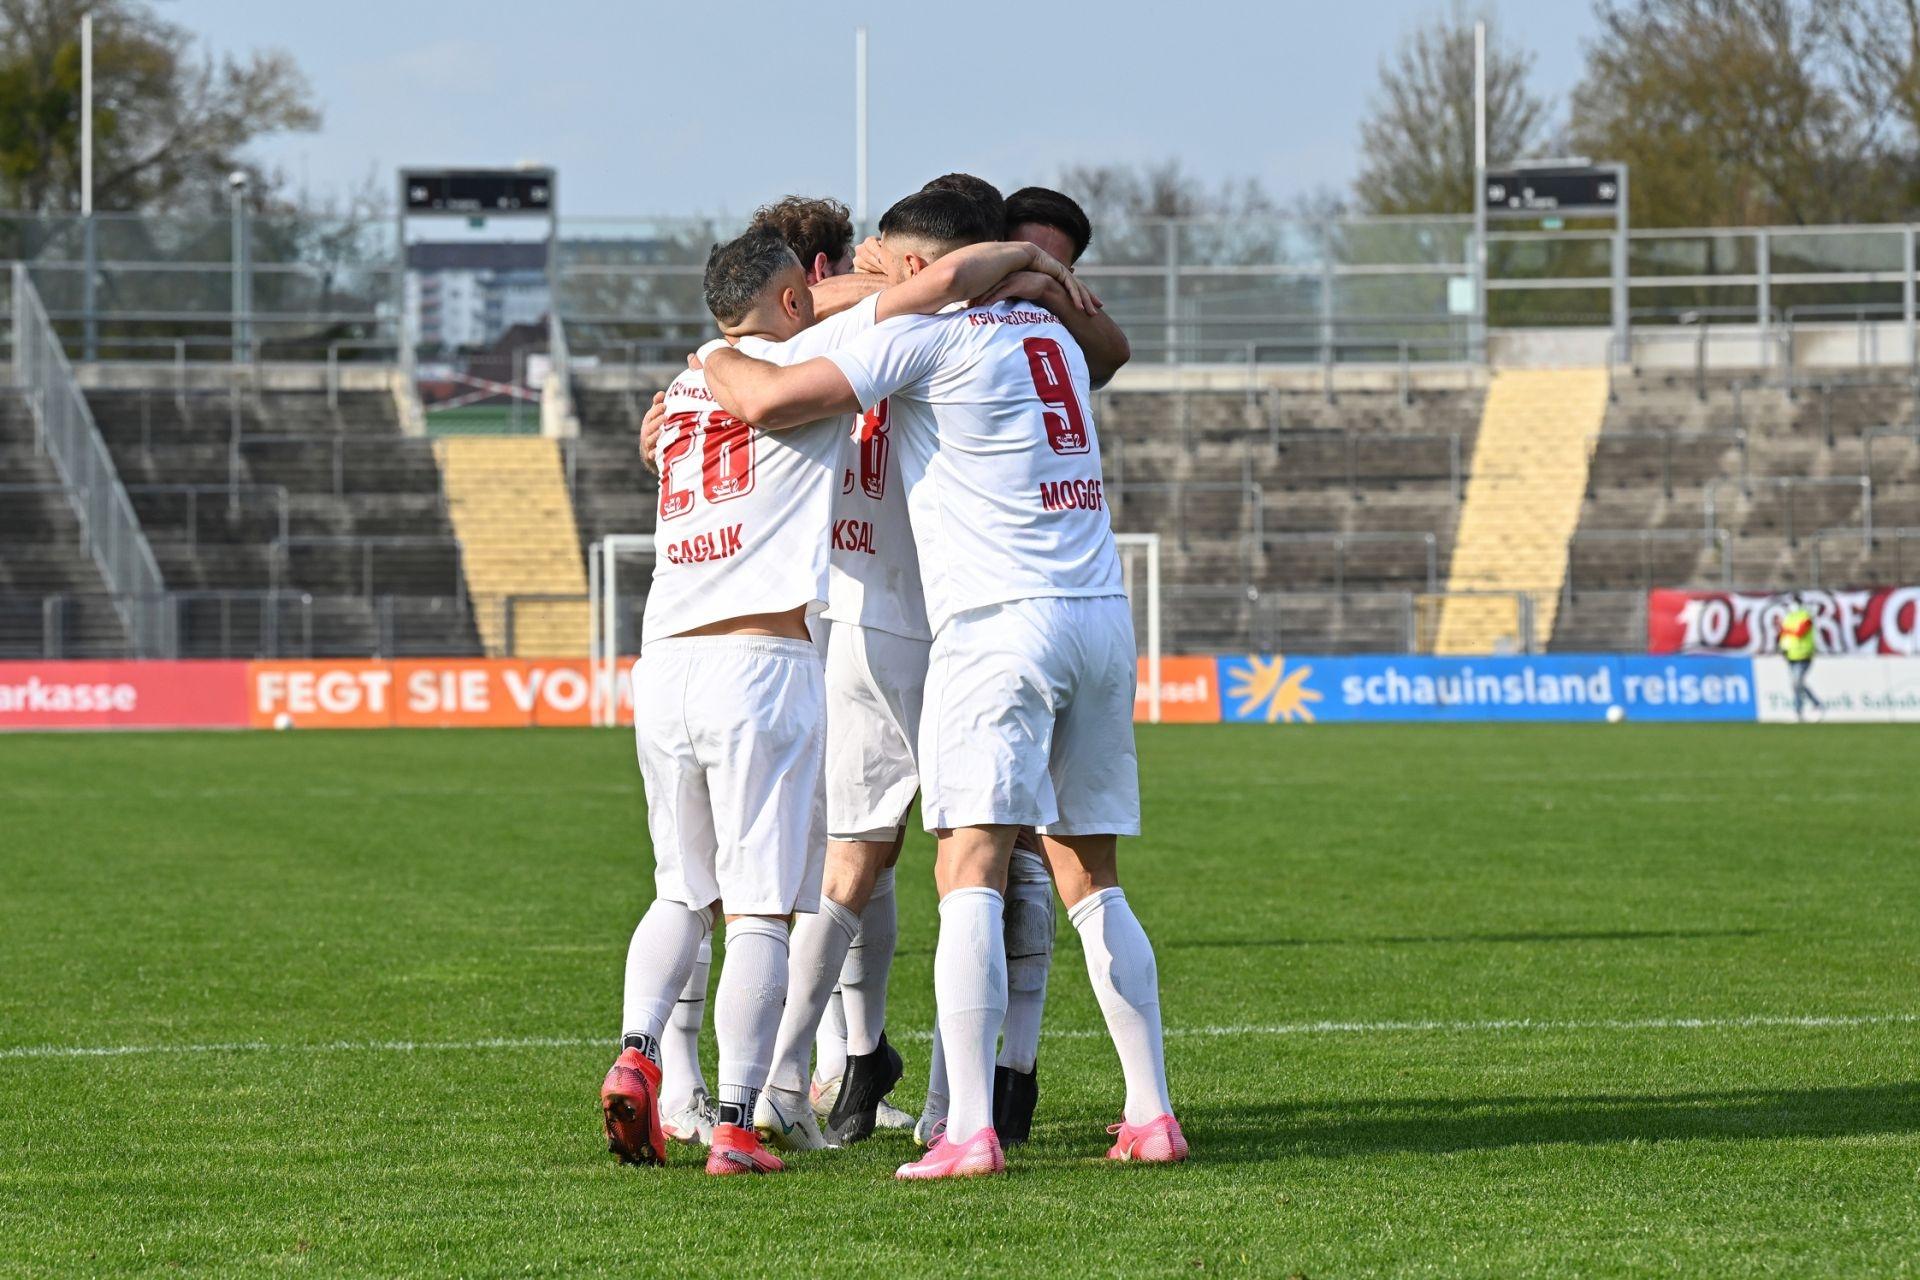 Regionalliga S�dwest 2020/21, KSV Hessen Kassel, Bahlinger SC, Endstand 1:1, Jubel zum 1:0